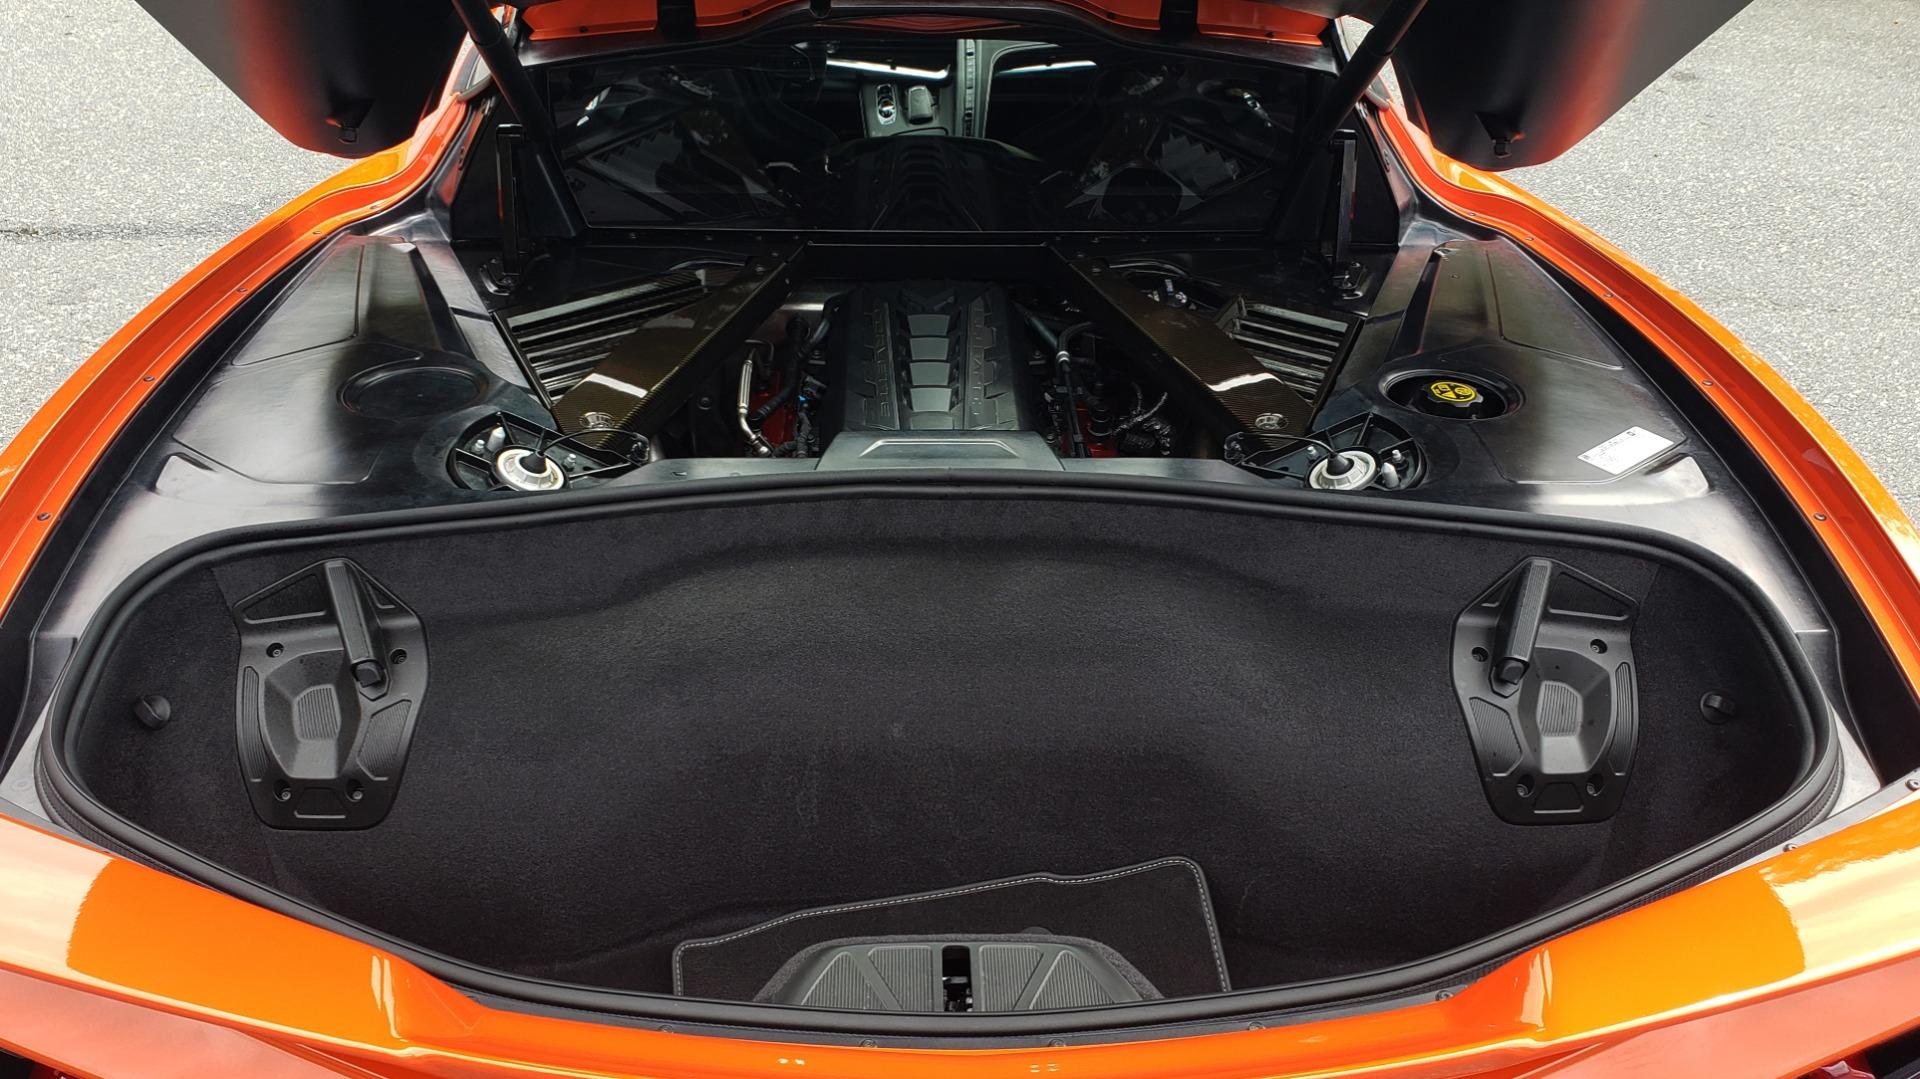 Used 2020 Chevrolet CORVETTE C8 STINGRAY 2LT / 6.2L V8 / 8-SPD AUTO / NAV / BOSE / REARVIEW / DATA RECOR for sale Sold at Formula Imports in Charlotte NC 28227 19